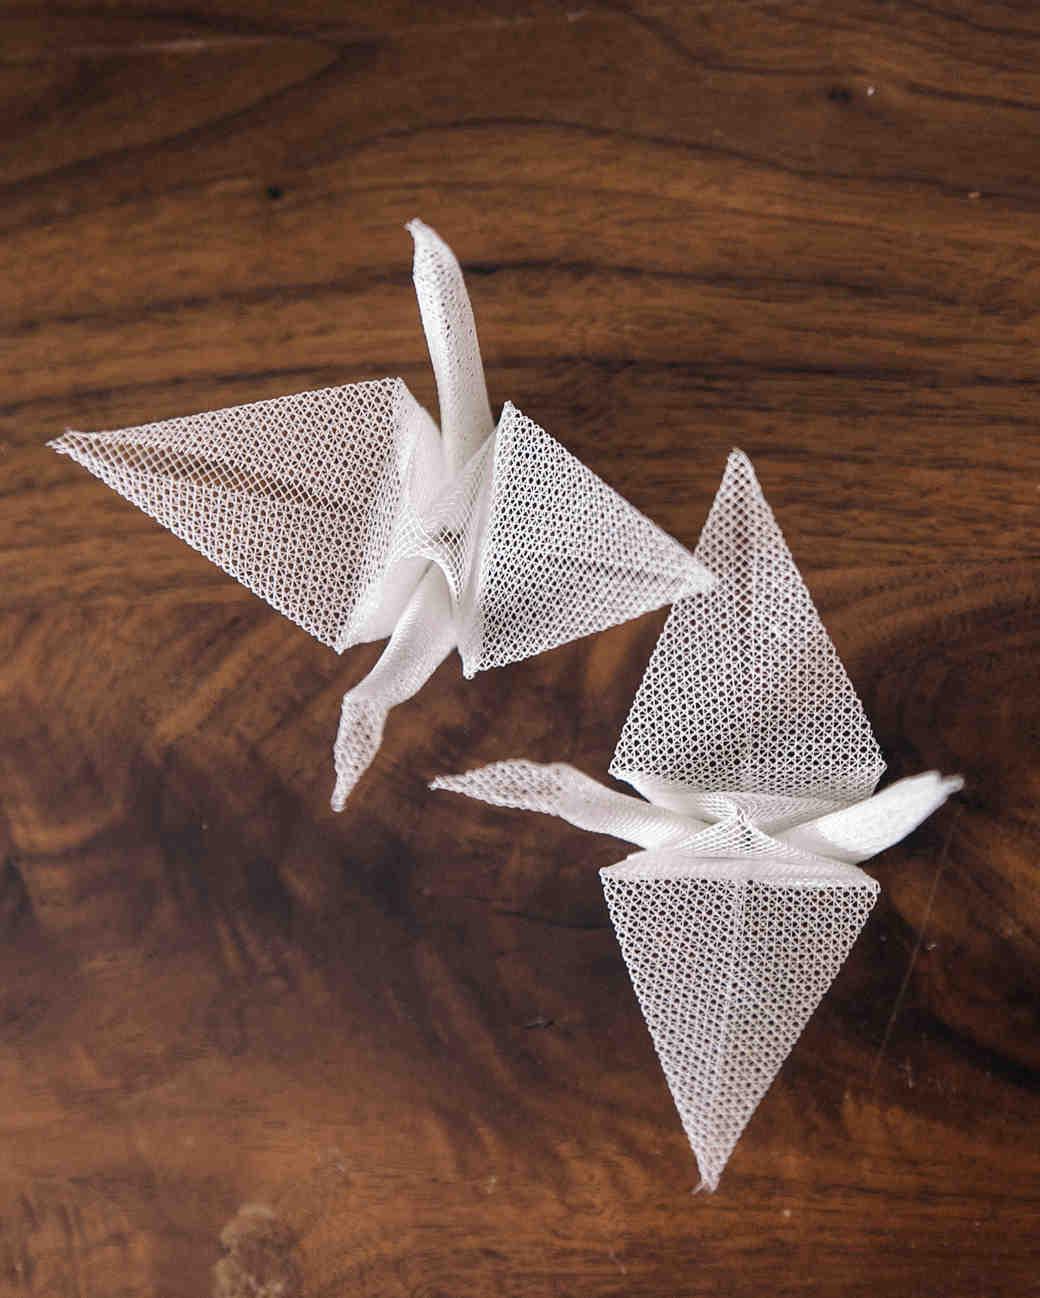 sadie-brandon-wedding-cranes-14-ss112173-0915.jpg